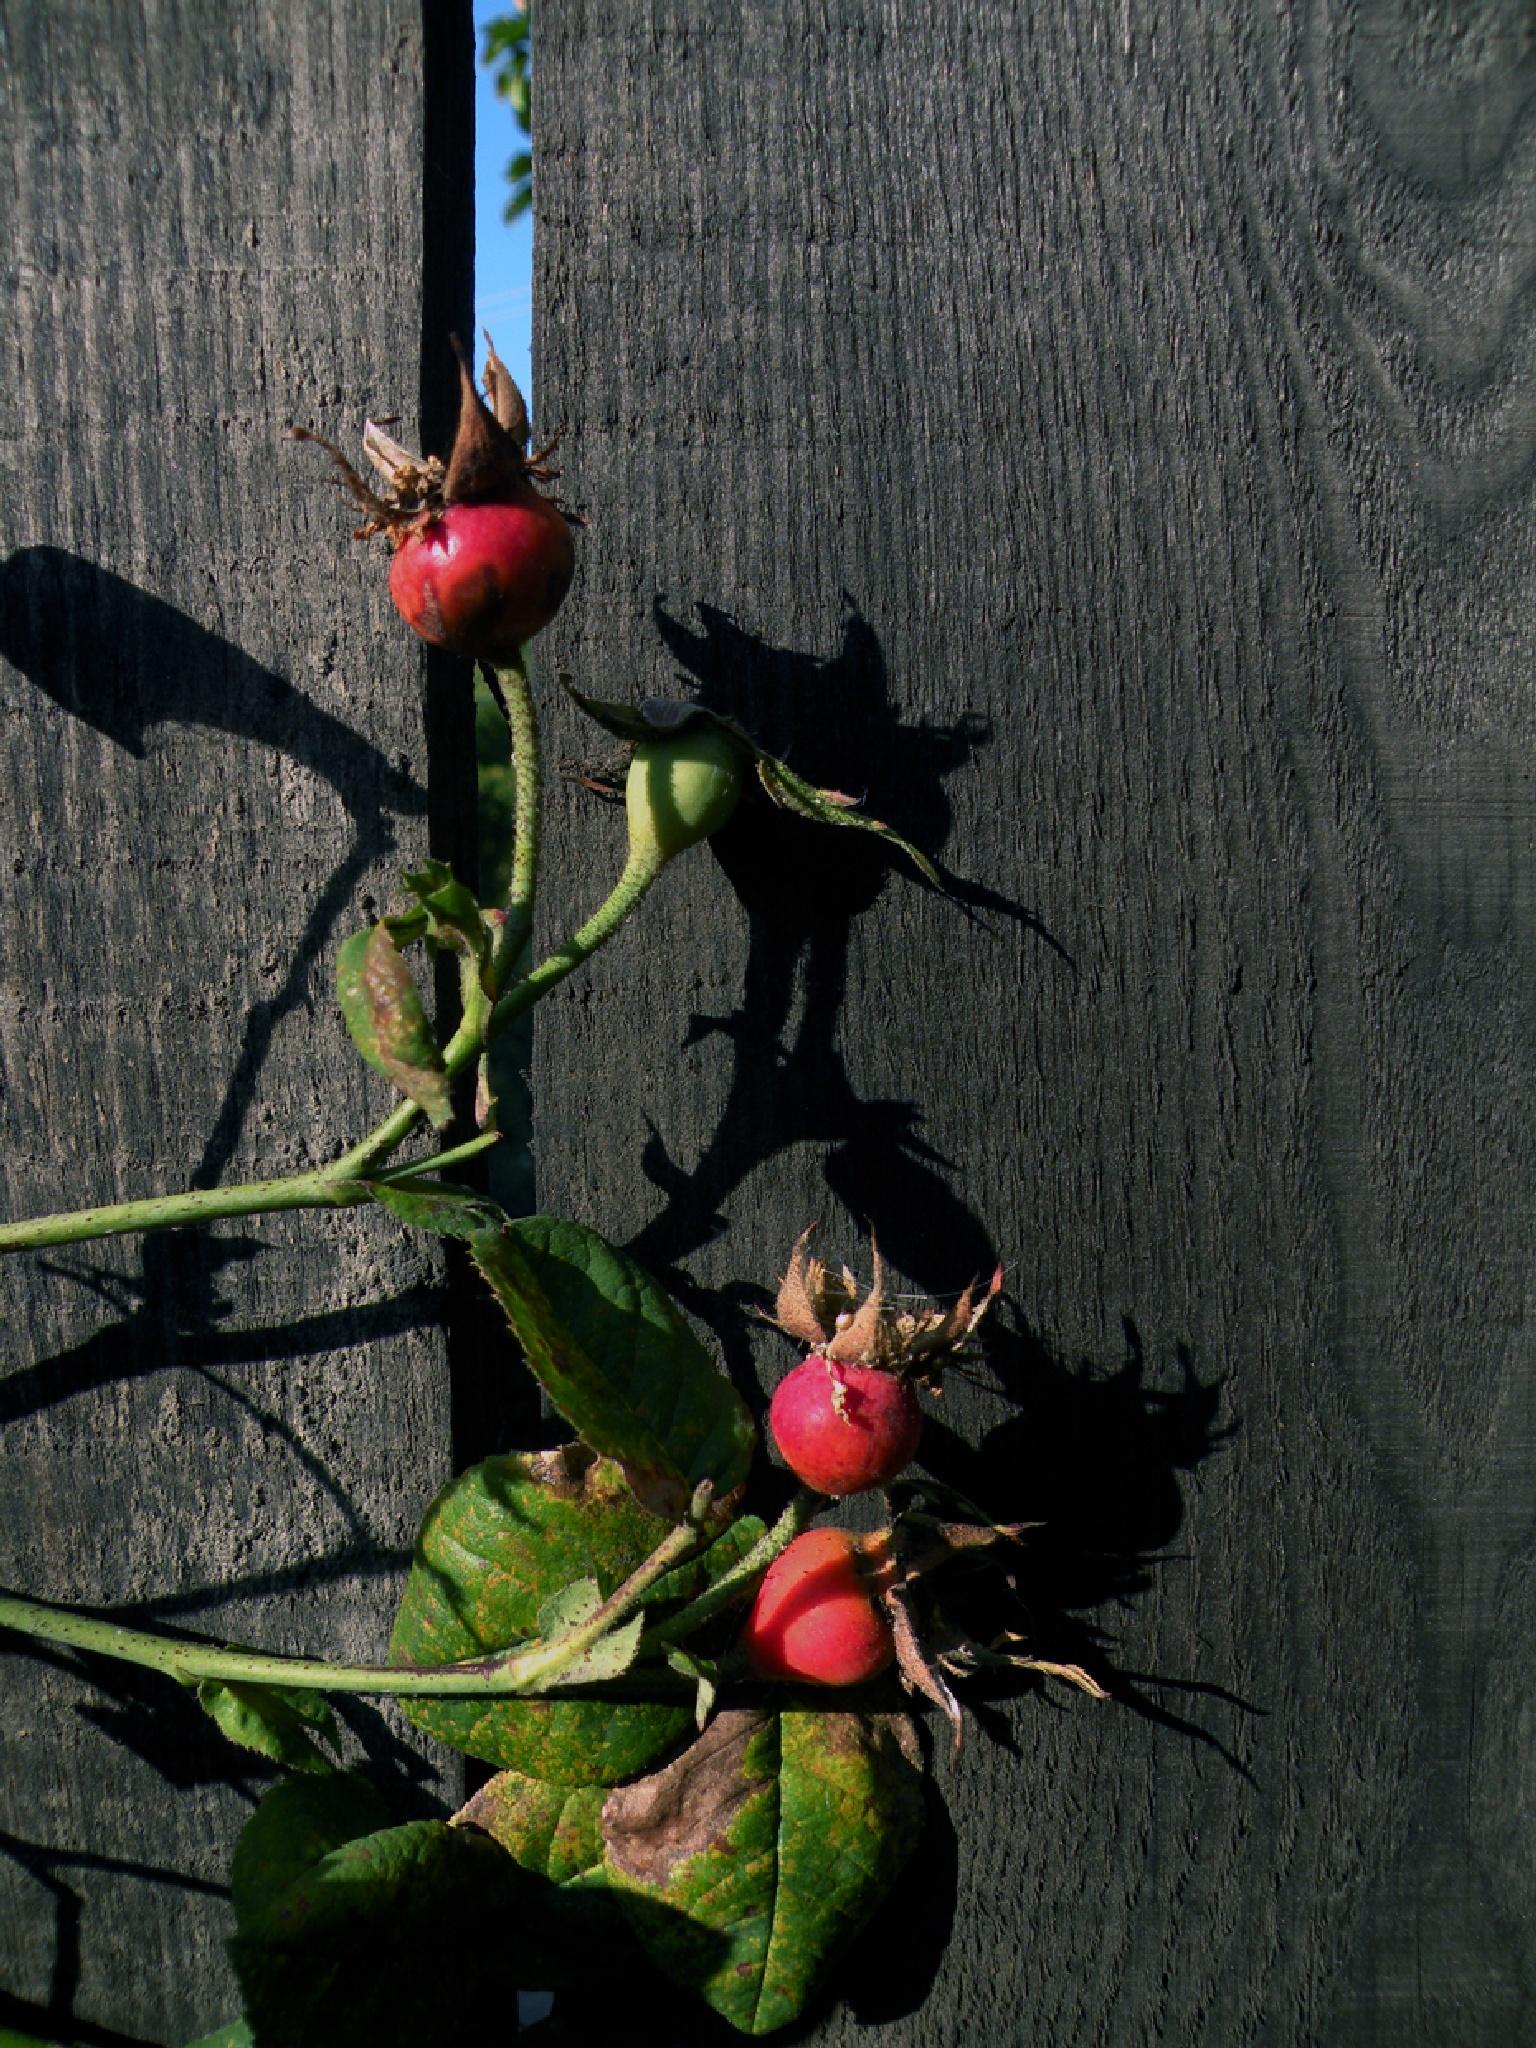 The fruit tea rose by Alexandr  V. Seleznov